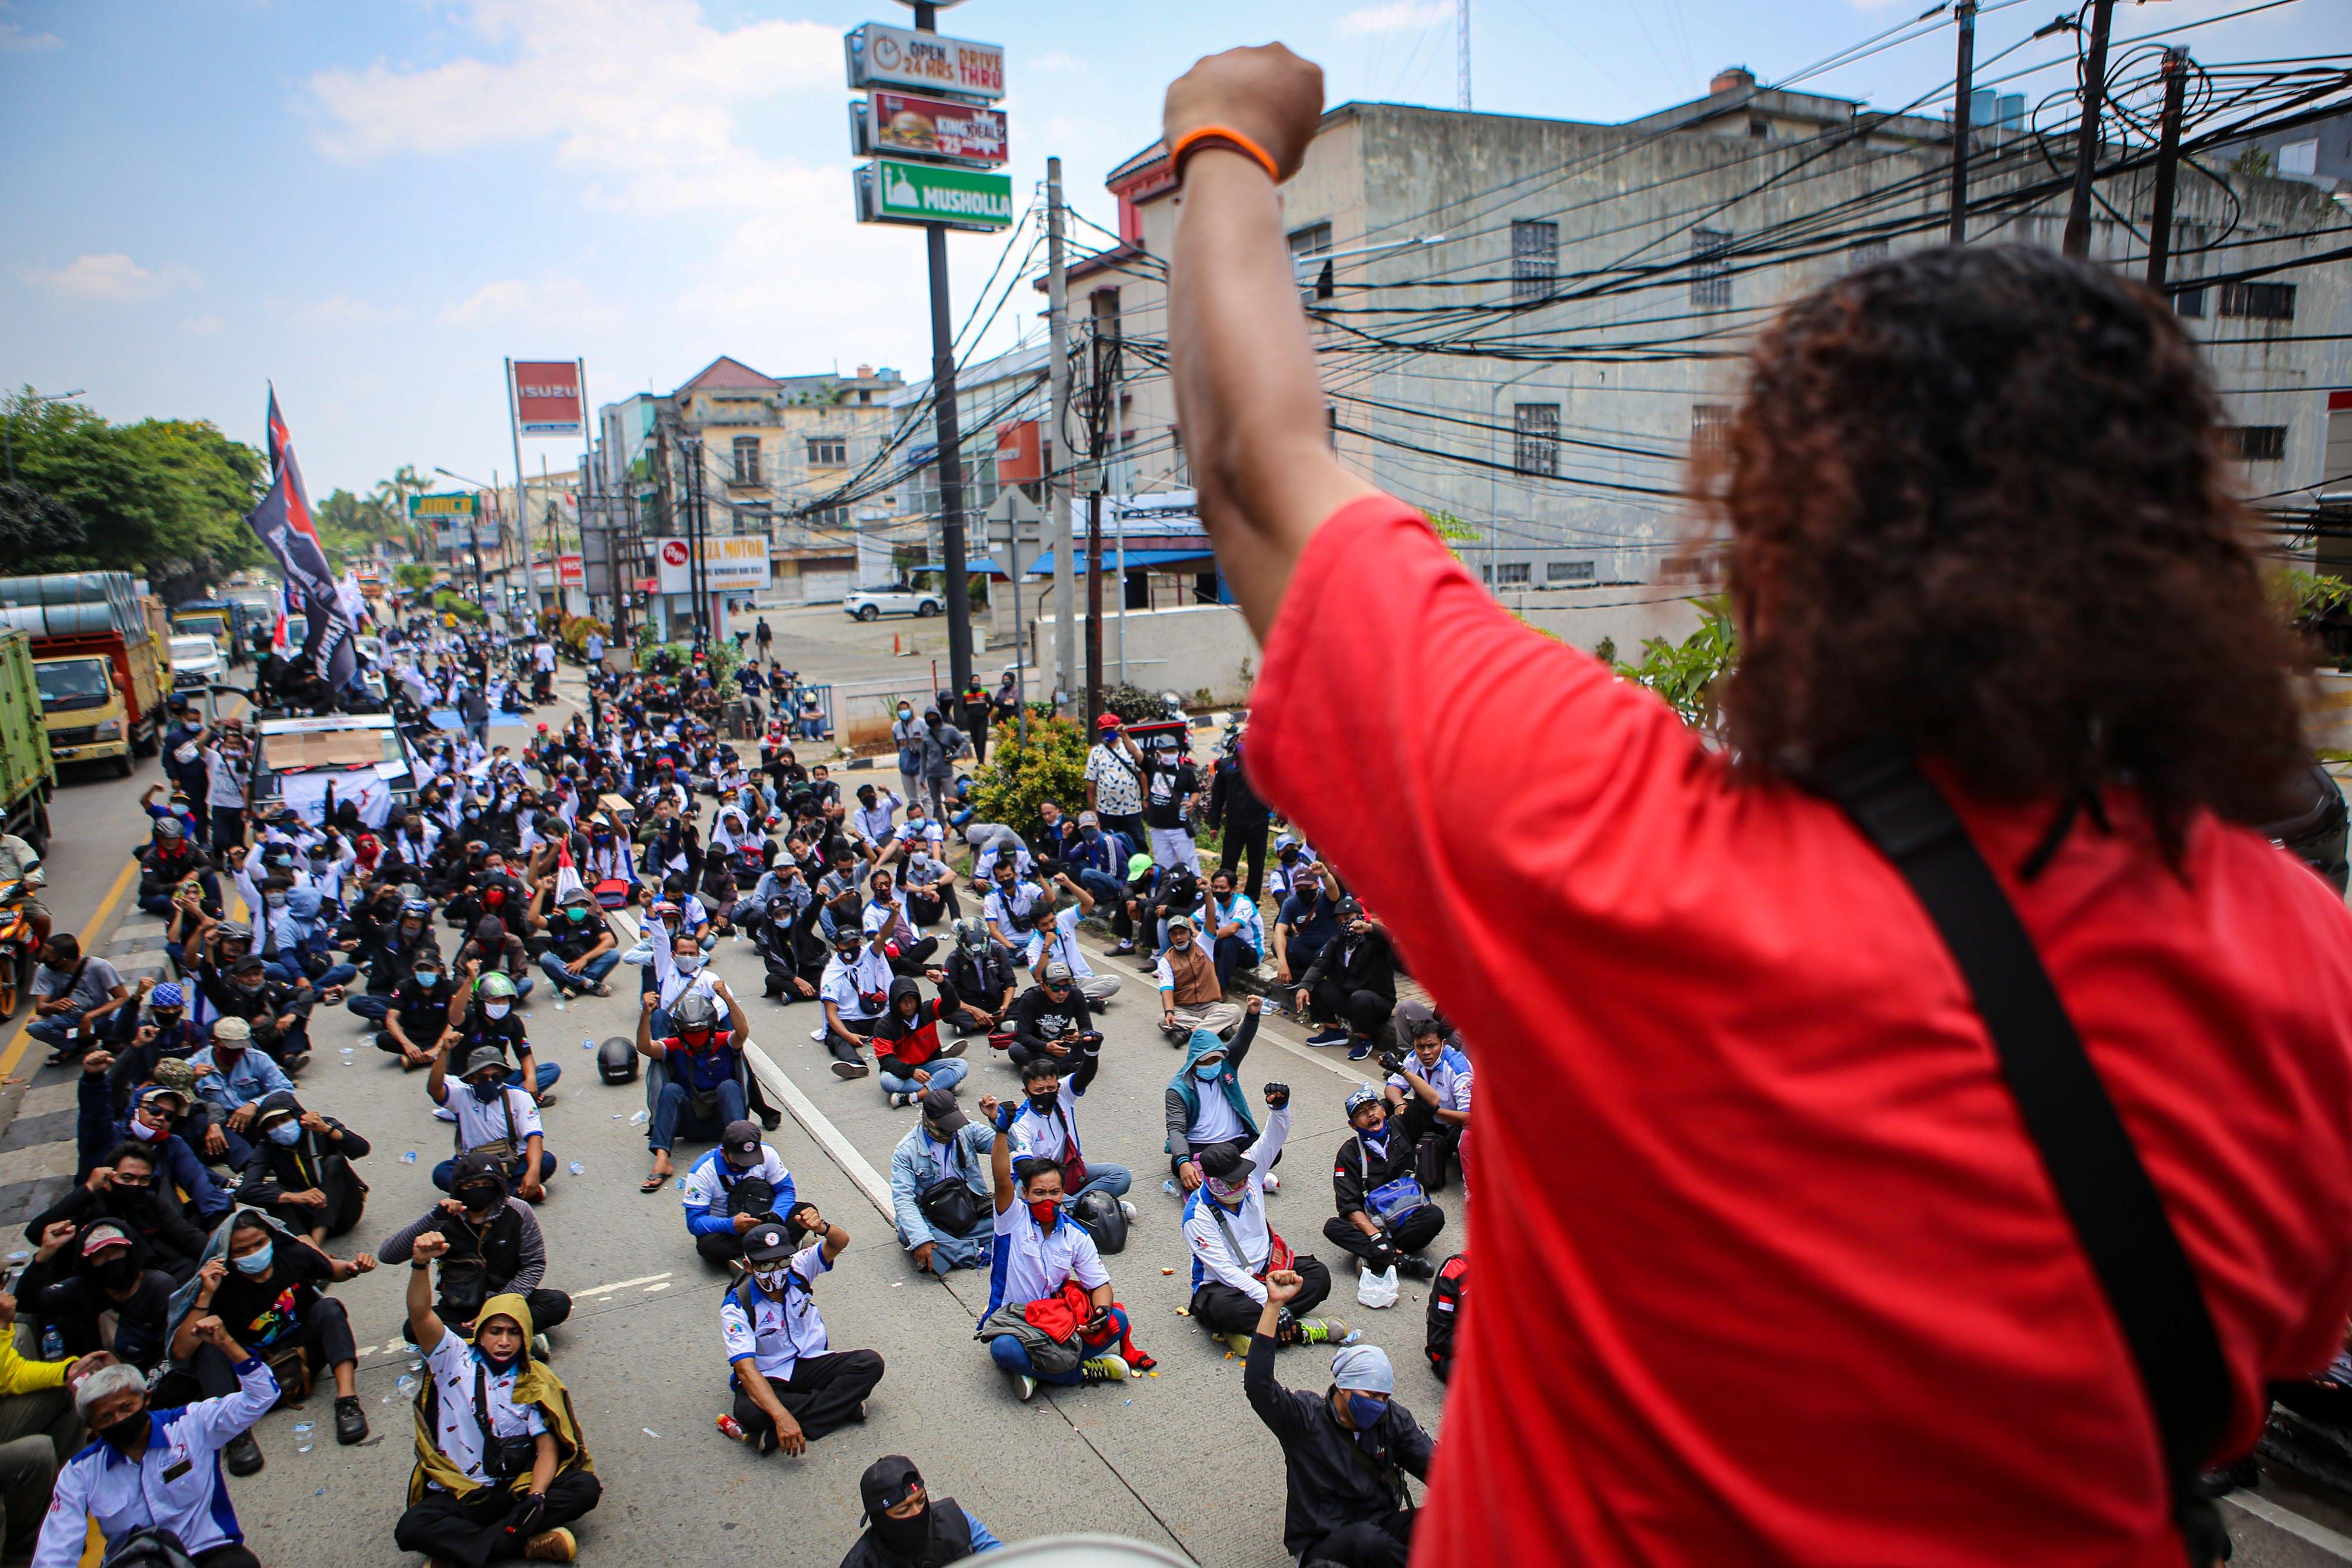 Ratusan buruh berunjuk rasa di kawasan Jatiuwung, Kota Tangerang, Banten, Senin (5/10/2020). Dalam aksinya mereka menolak \'omnibus law\' dan mengancam akan melakukan mogok kerja pada 6-8 Oktober 2020.